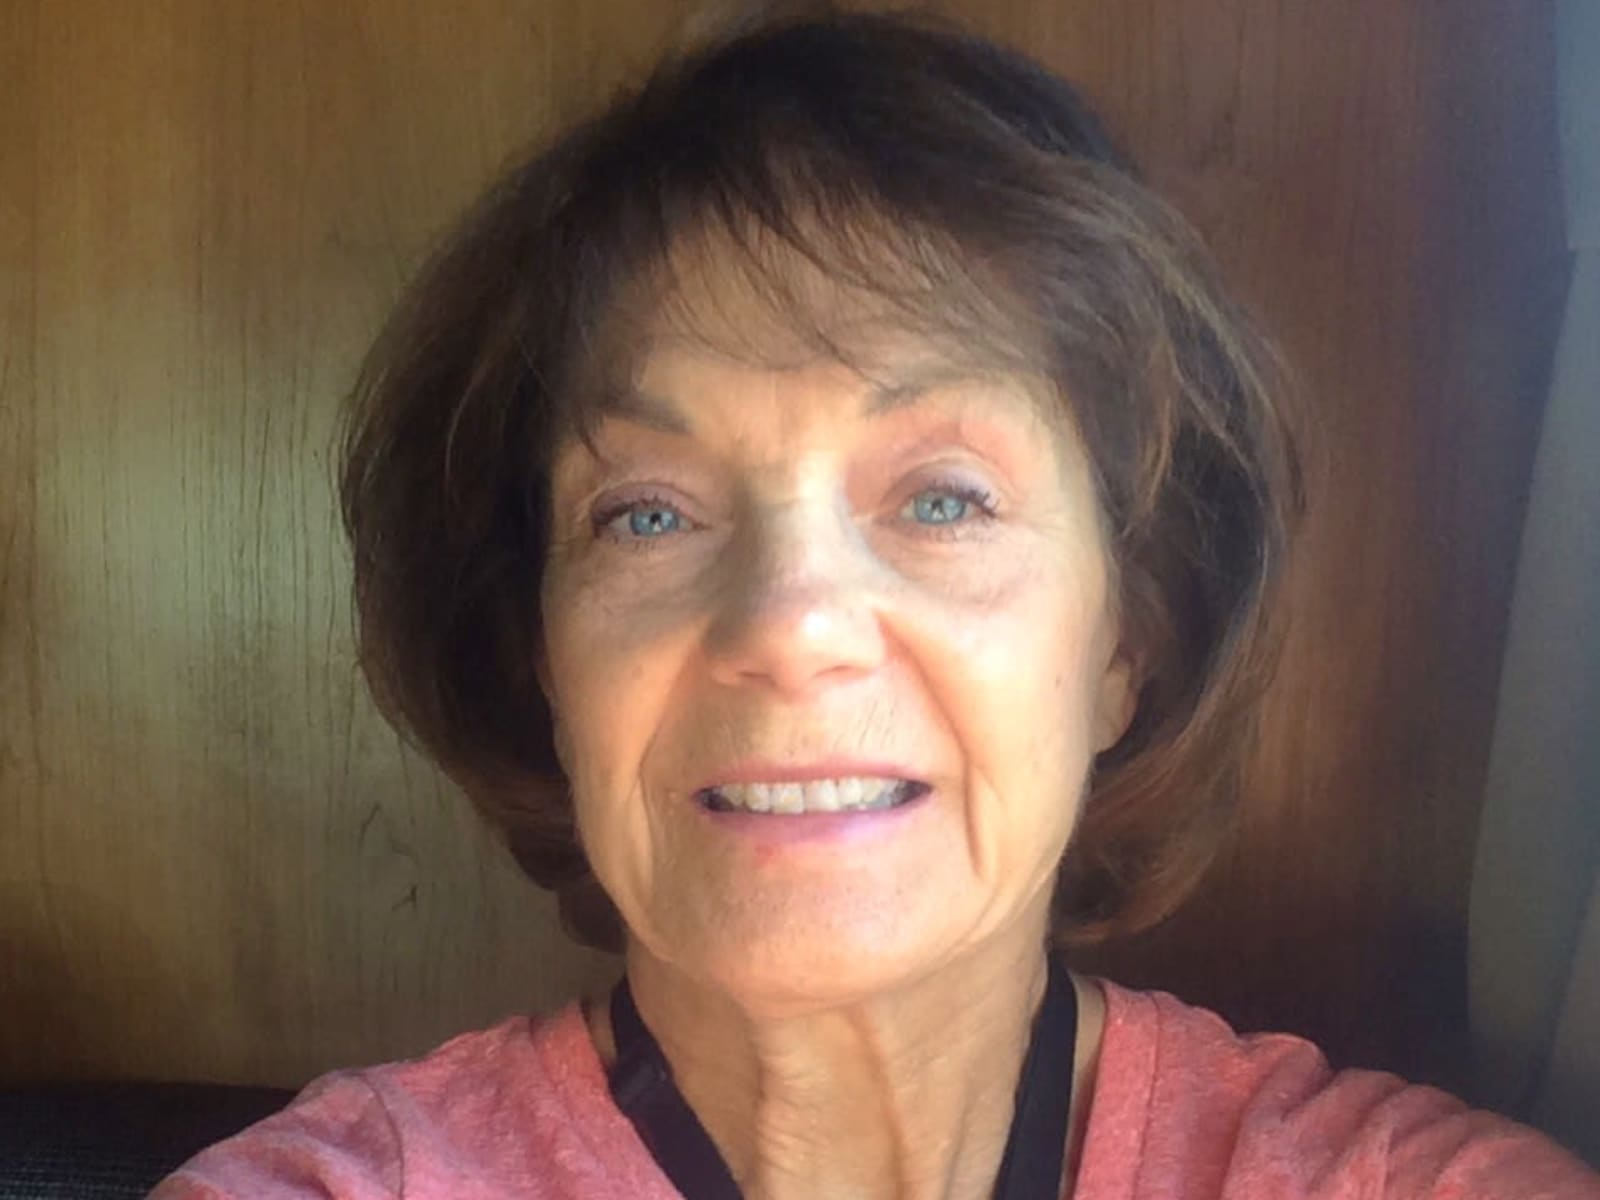 Marsha from Hebron, Kentucky, United States